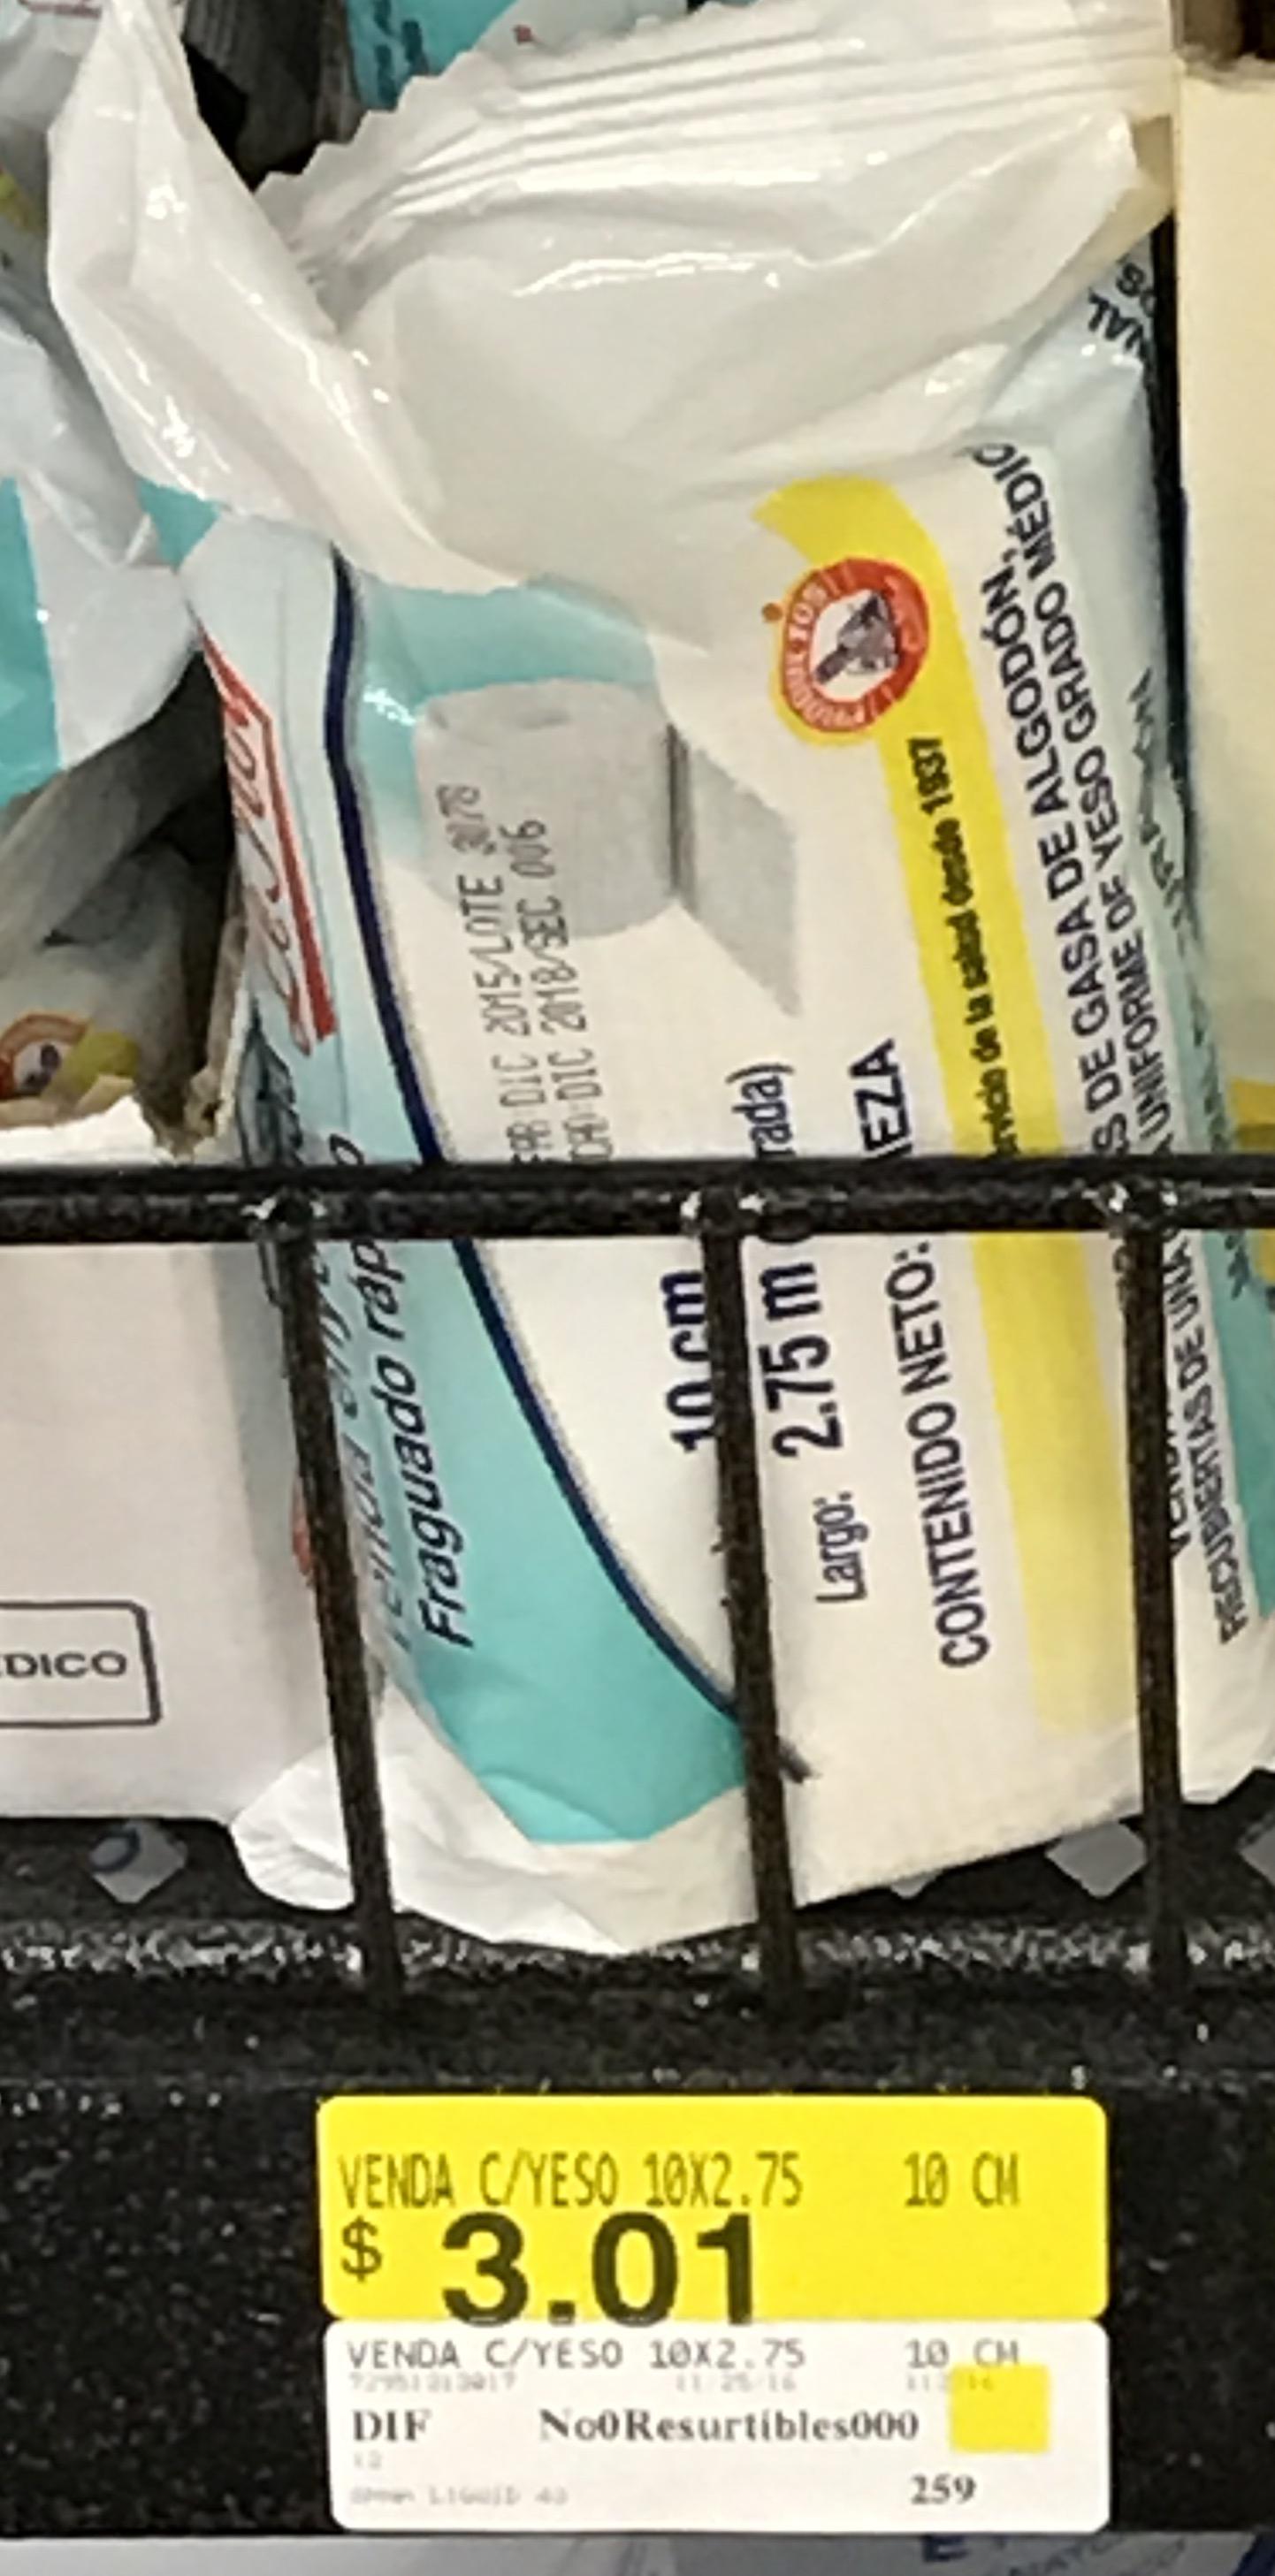 Walmart (CDMX): venda c/yeso marca Leroy a $3.01